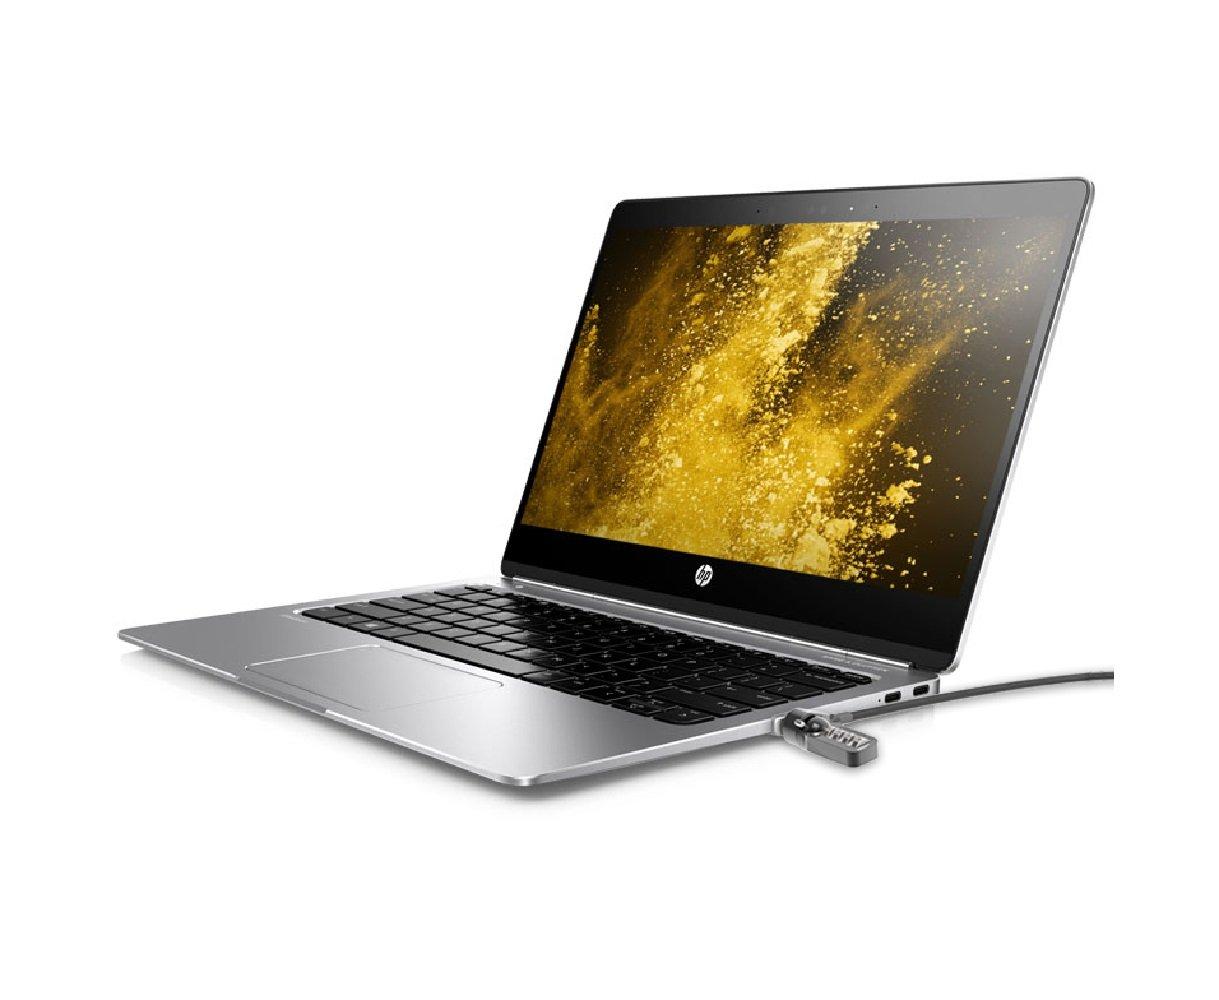 Maclocks FLLDG01KL, Security Leptop Ledge Slot Lock Adapter with Key Cable Lock for HP EliteBook